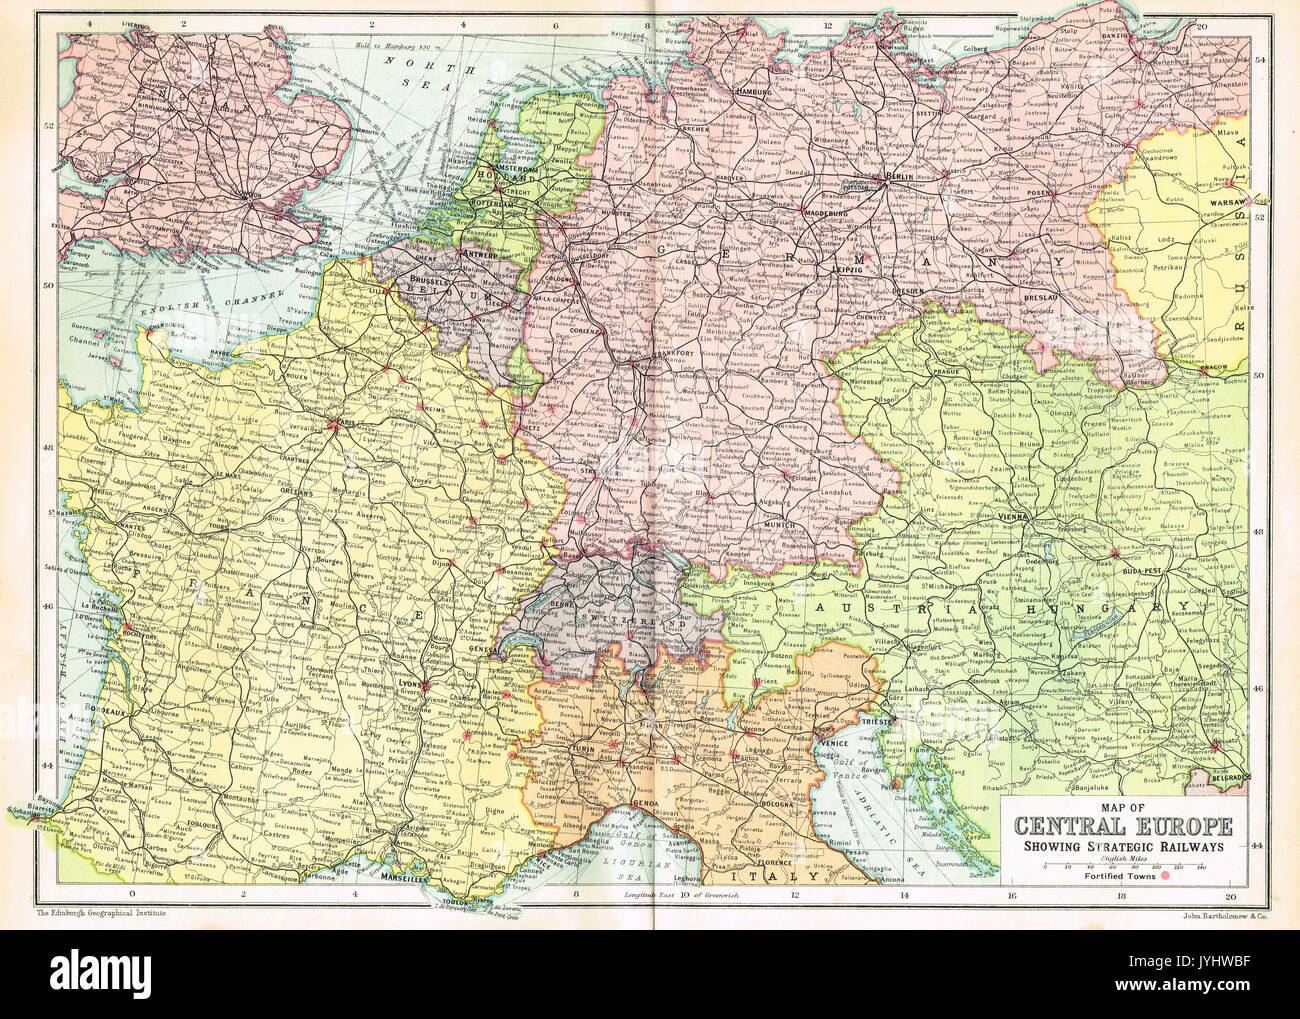 Map Europe World War One Stock Photos & Map Europe World War ...